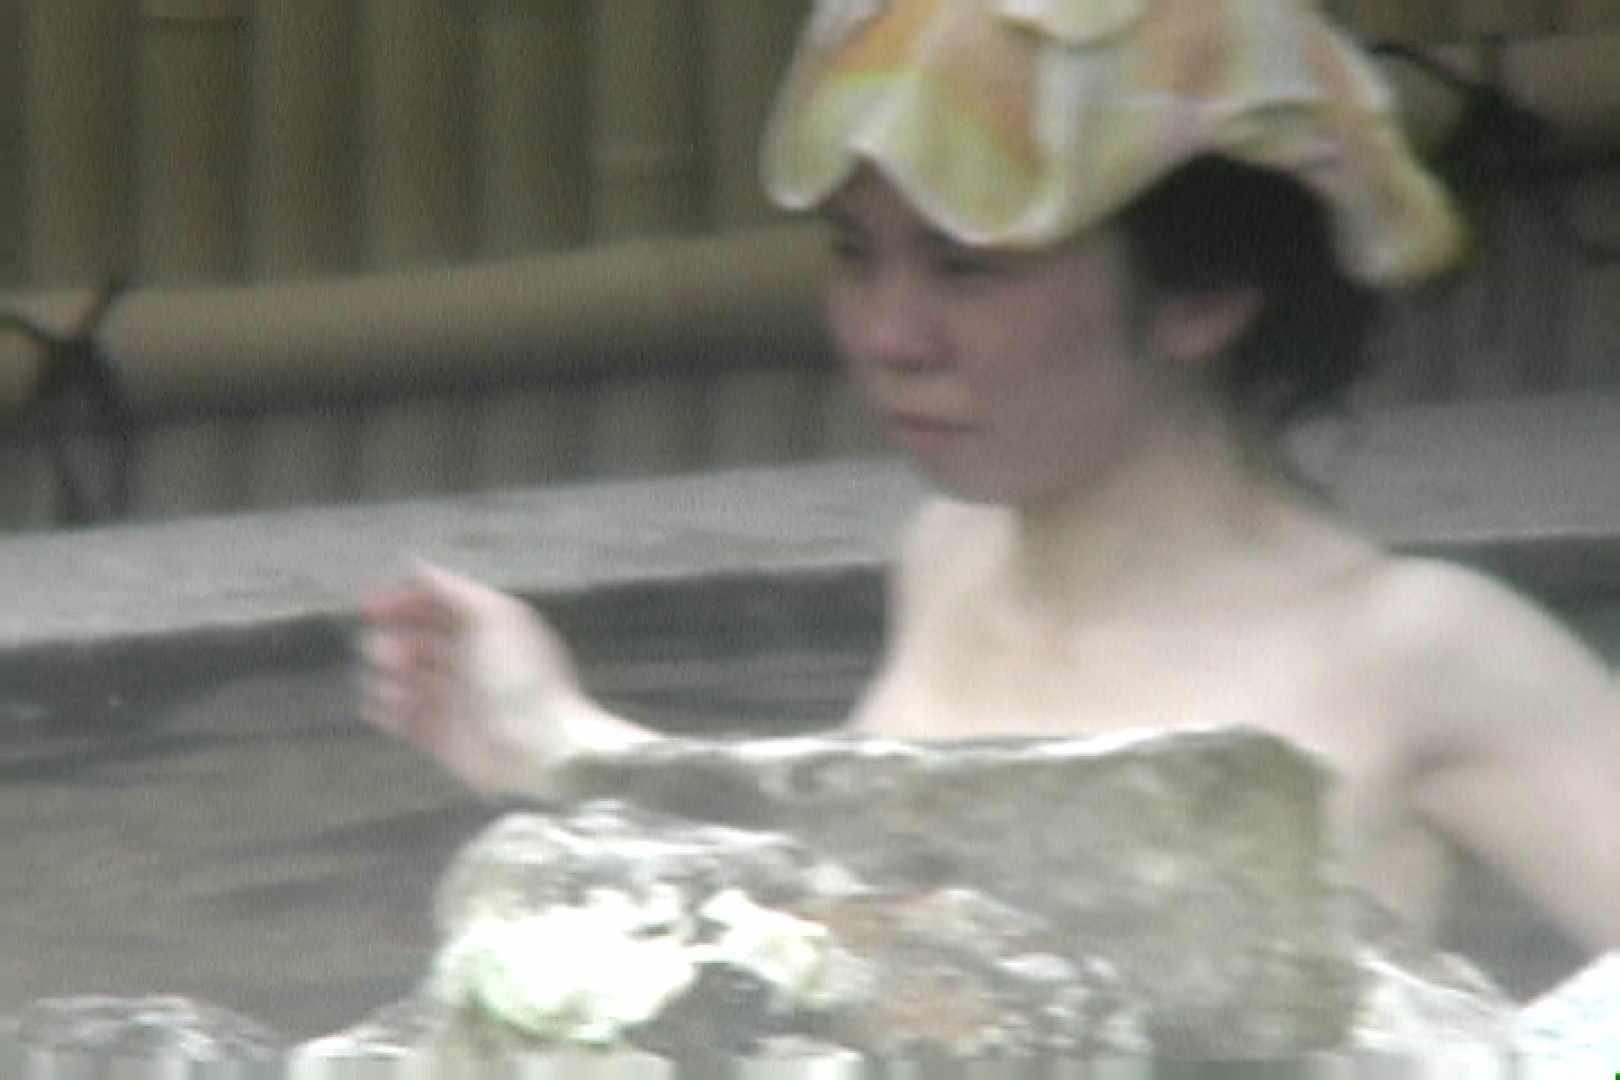 Aquaな露天風呂Vol.687 露天 隠し撮りオマンコ動画紹介 63画像 17